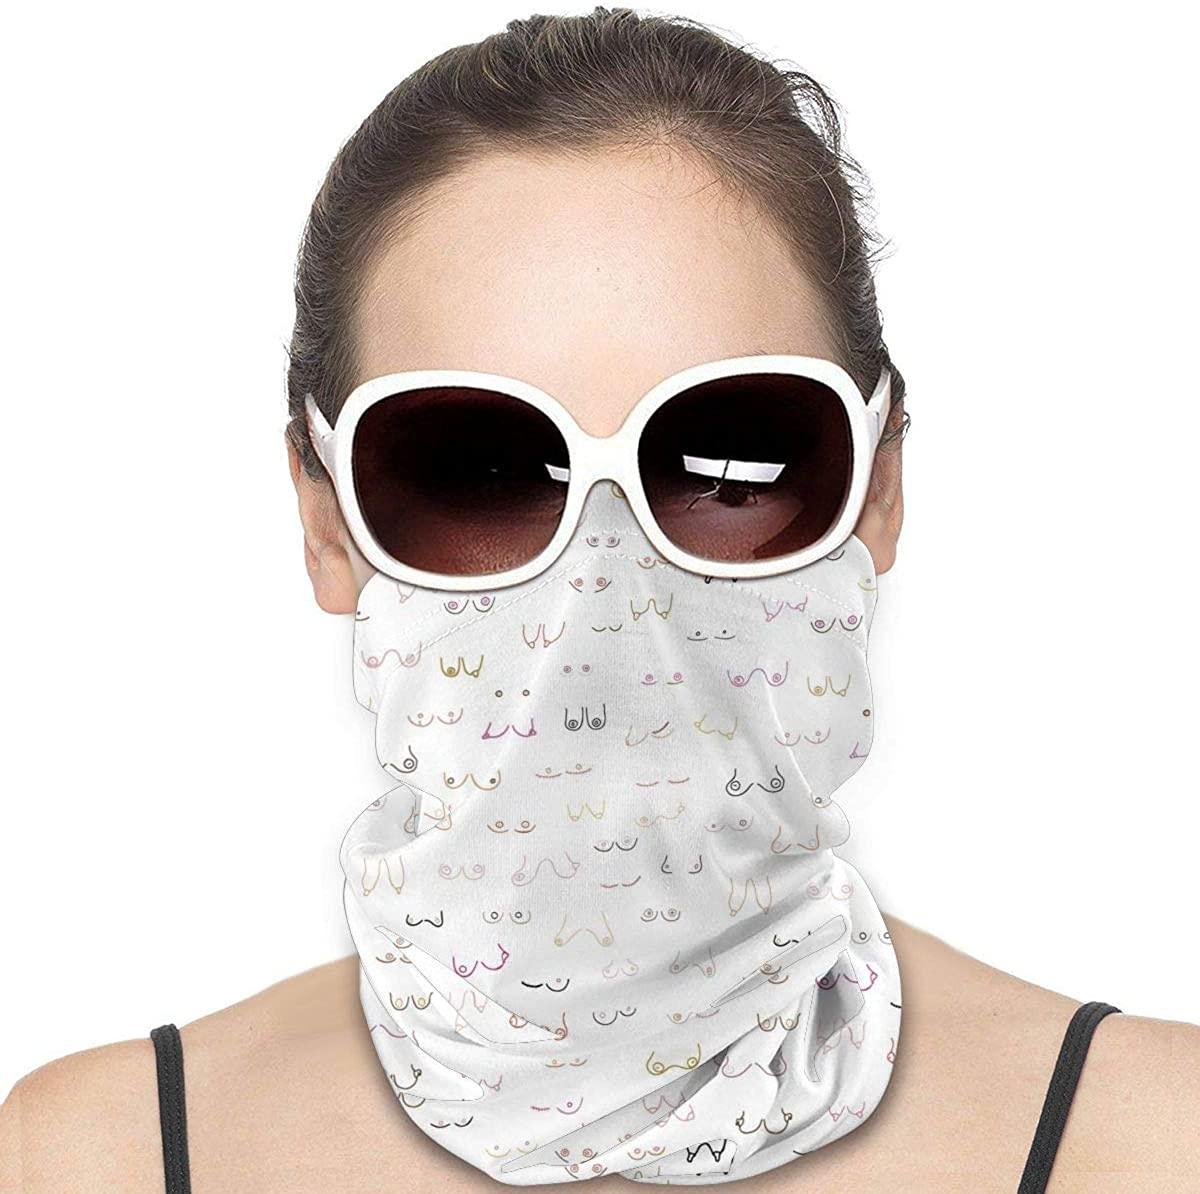 Tidyki Neck Gaiters for Men - All Boobs are Beautiful Face Shields for Men Bandana Face Mask Face Shield Head Bands Neck Warmer Men Headband Face Mask Bandana